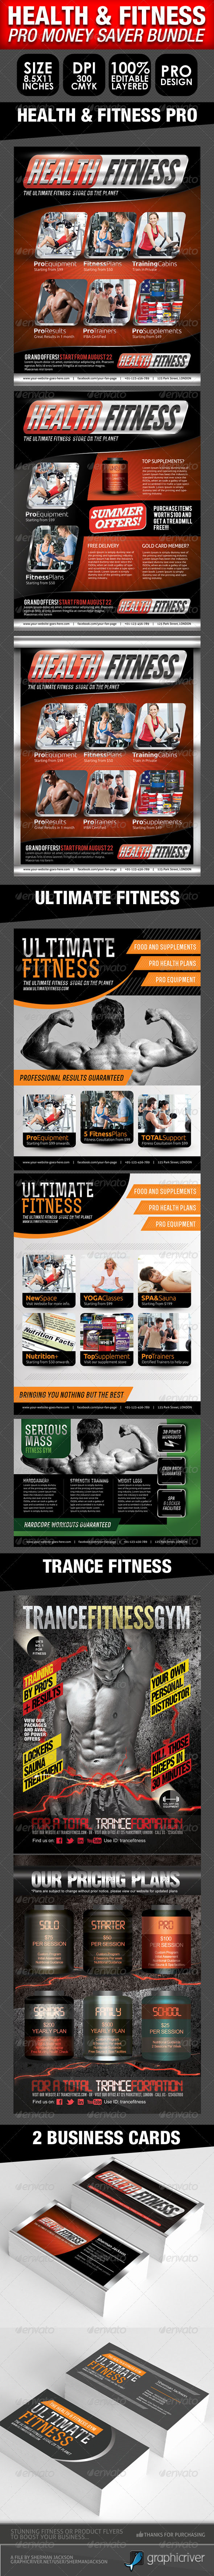 Health, Sports, Fitness Flyer Bundle  - Commerce Flyers